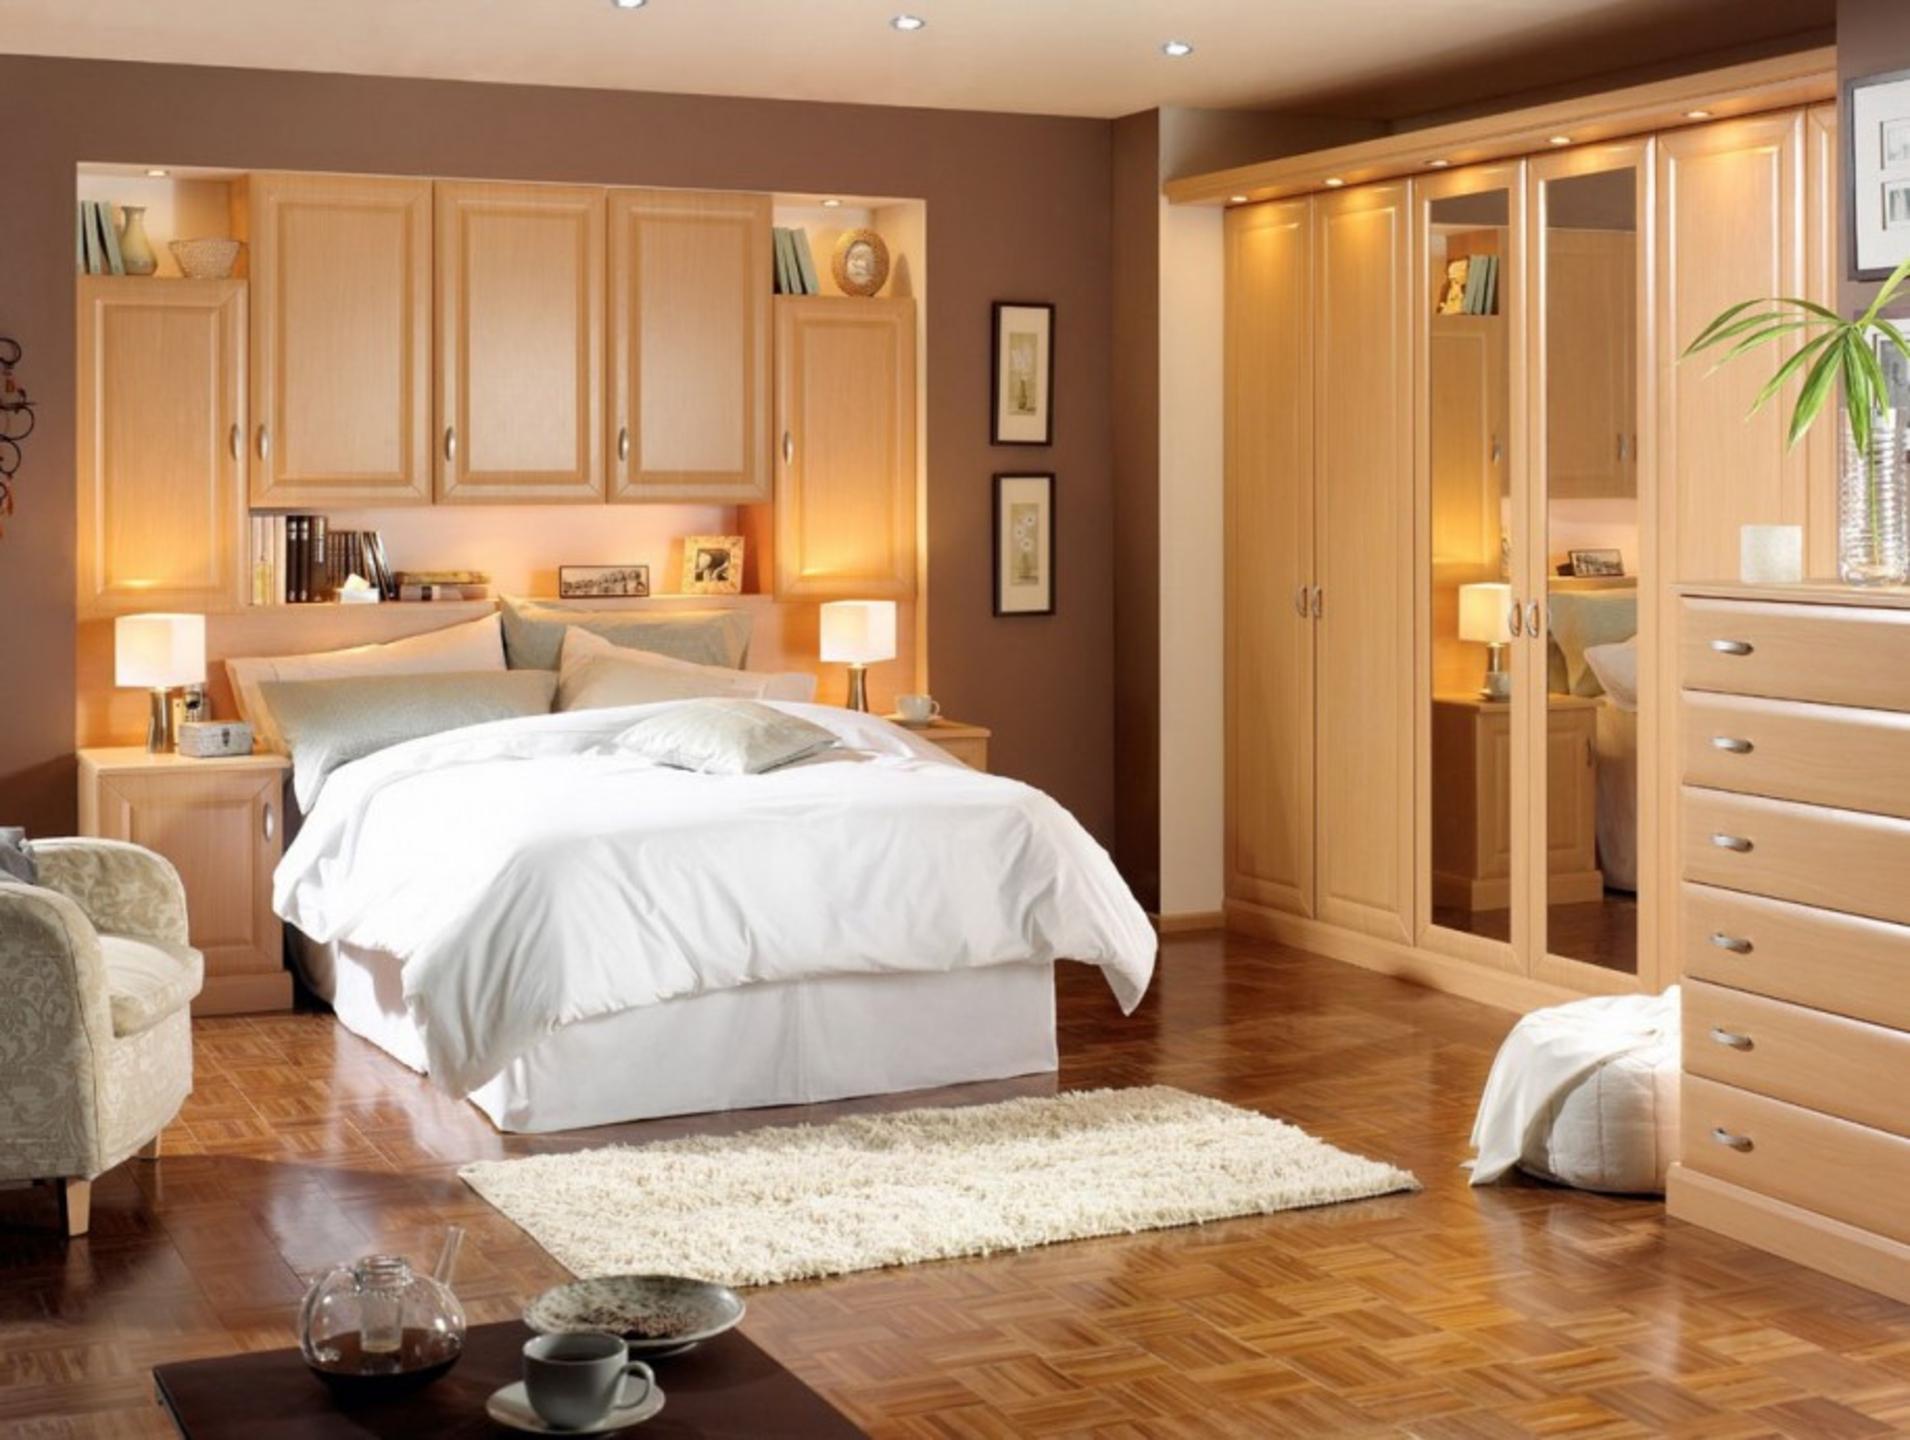 Traditional-bedroom-interior-design-4